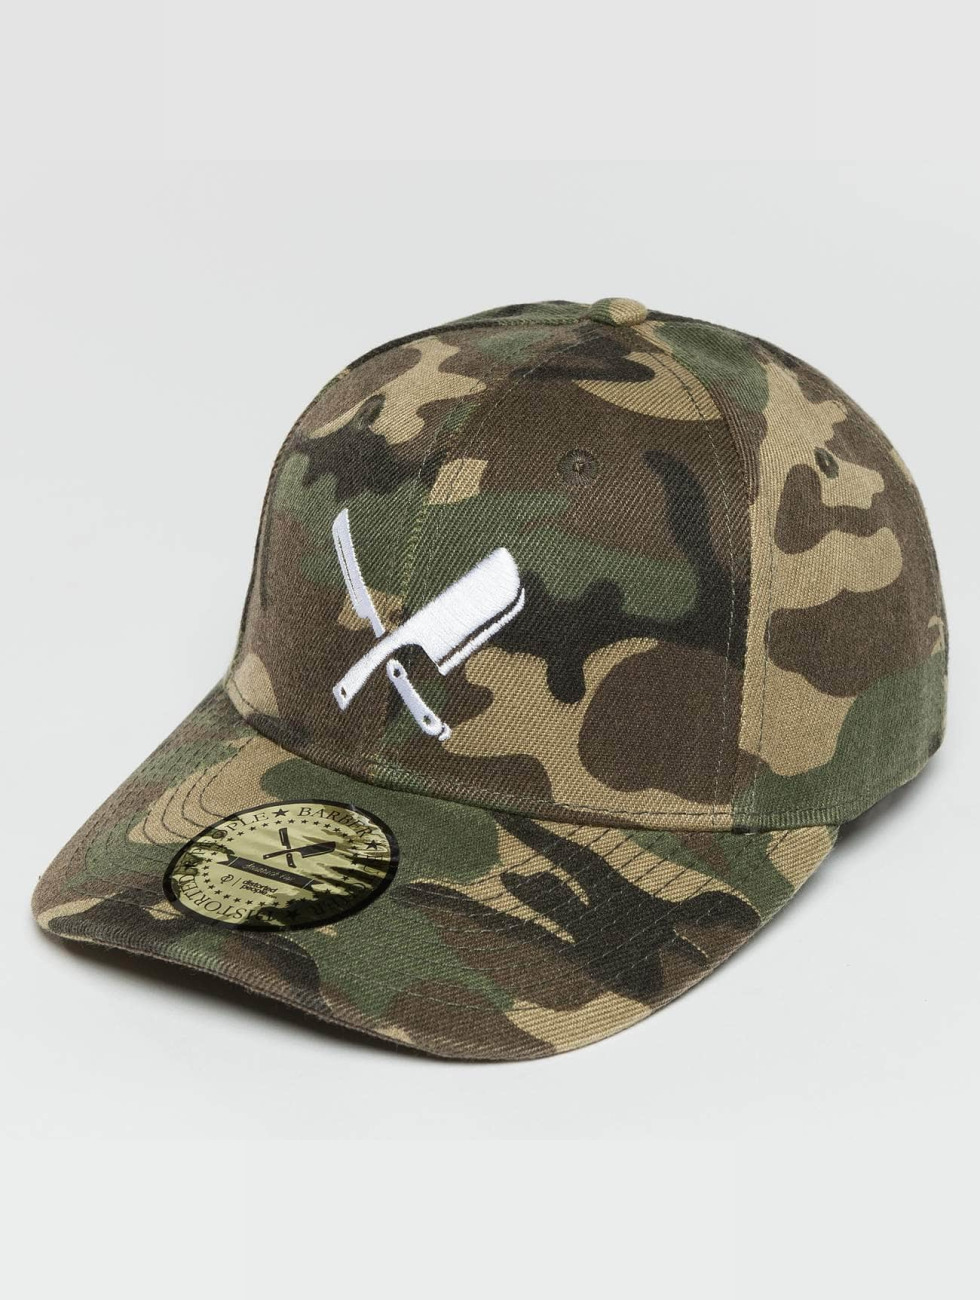 Distorted People Snapback Cap Blades camouflage